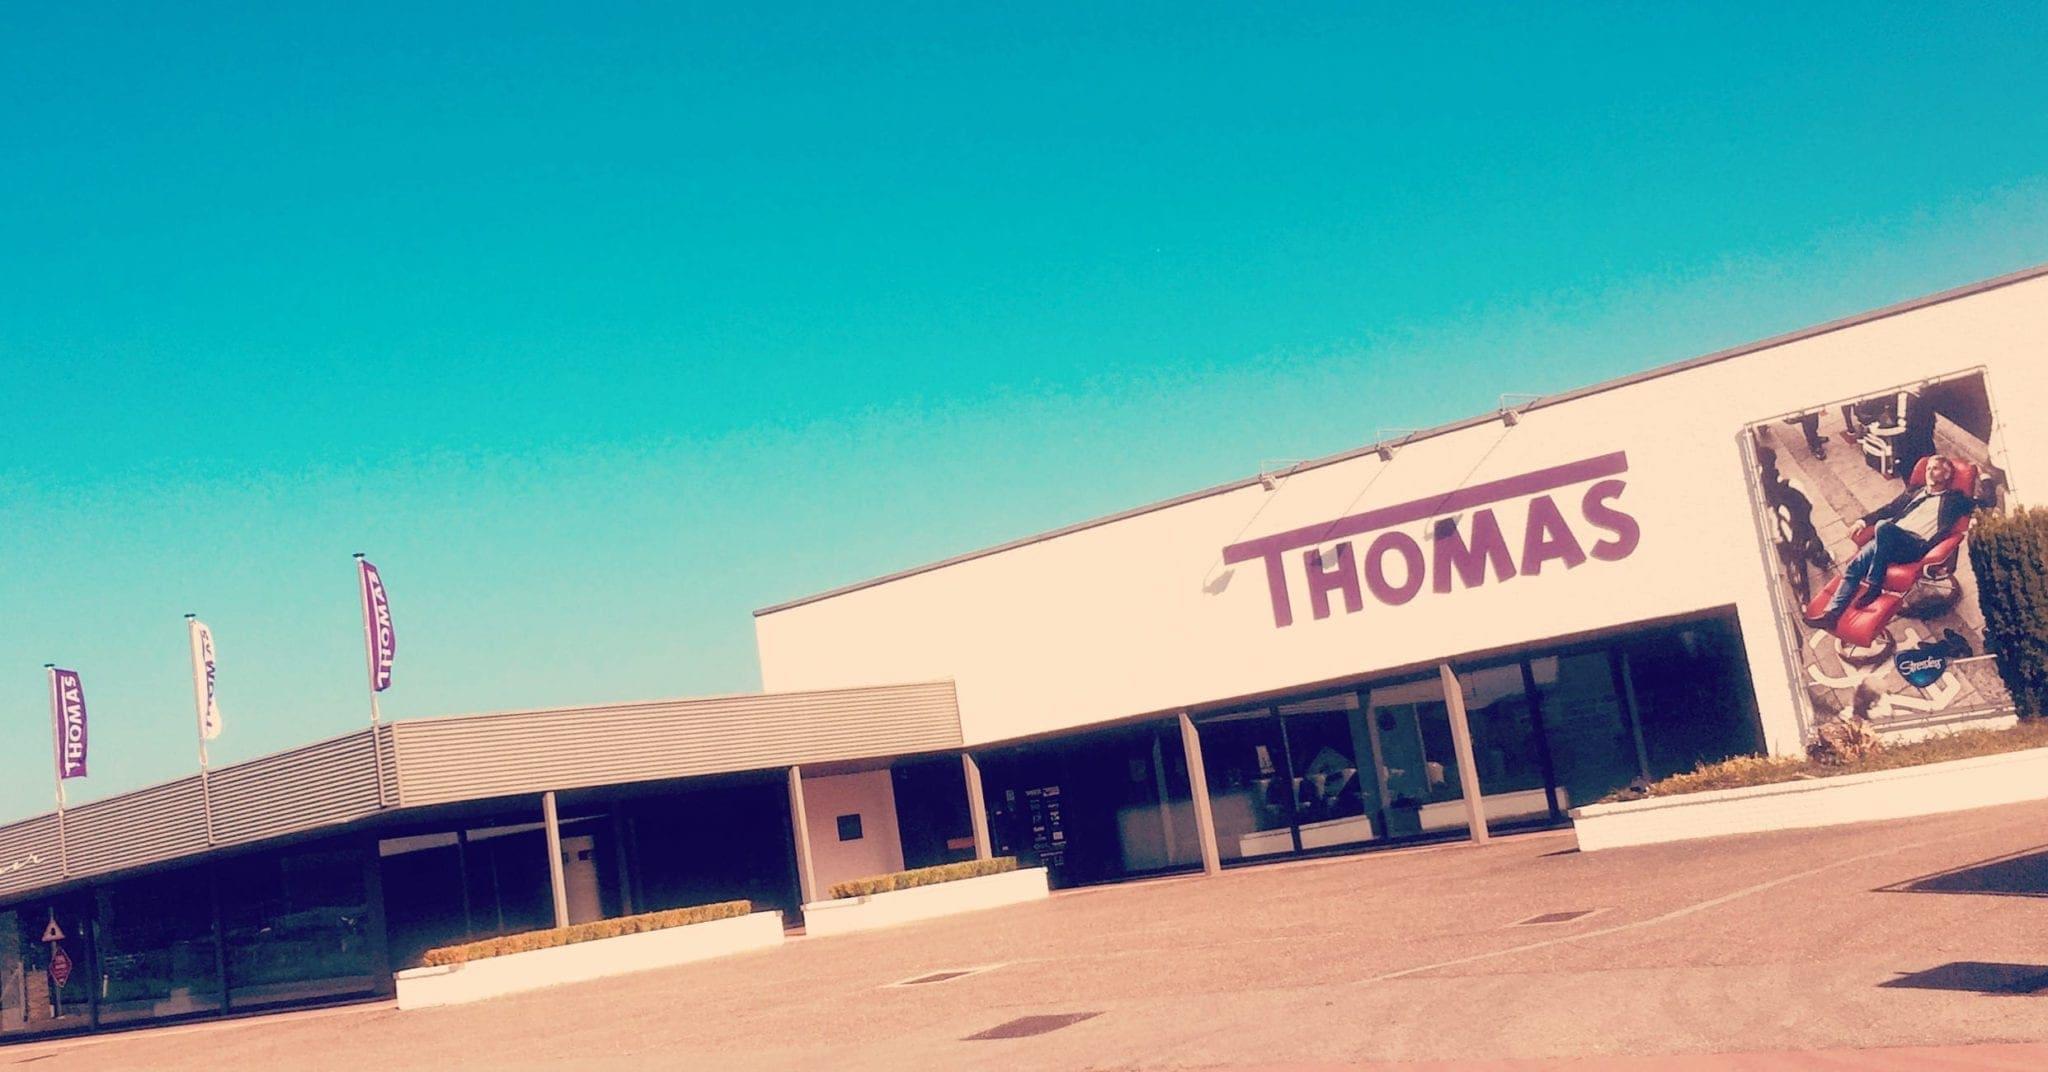 Bankstellen Uitverkoop Limburg.Home Thomas Interieur